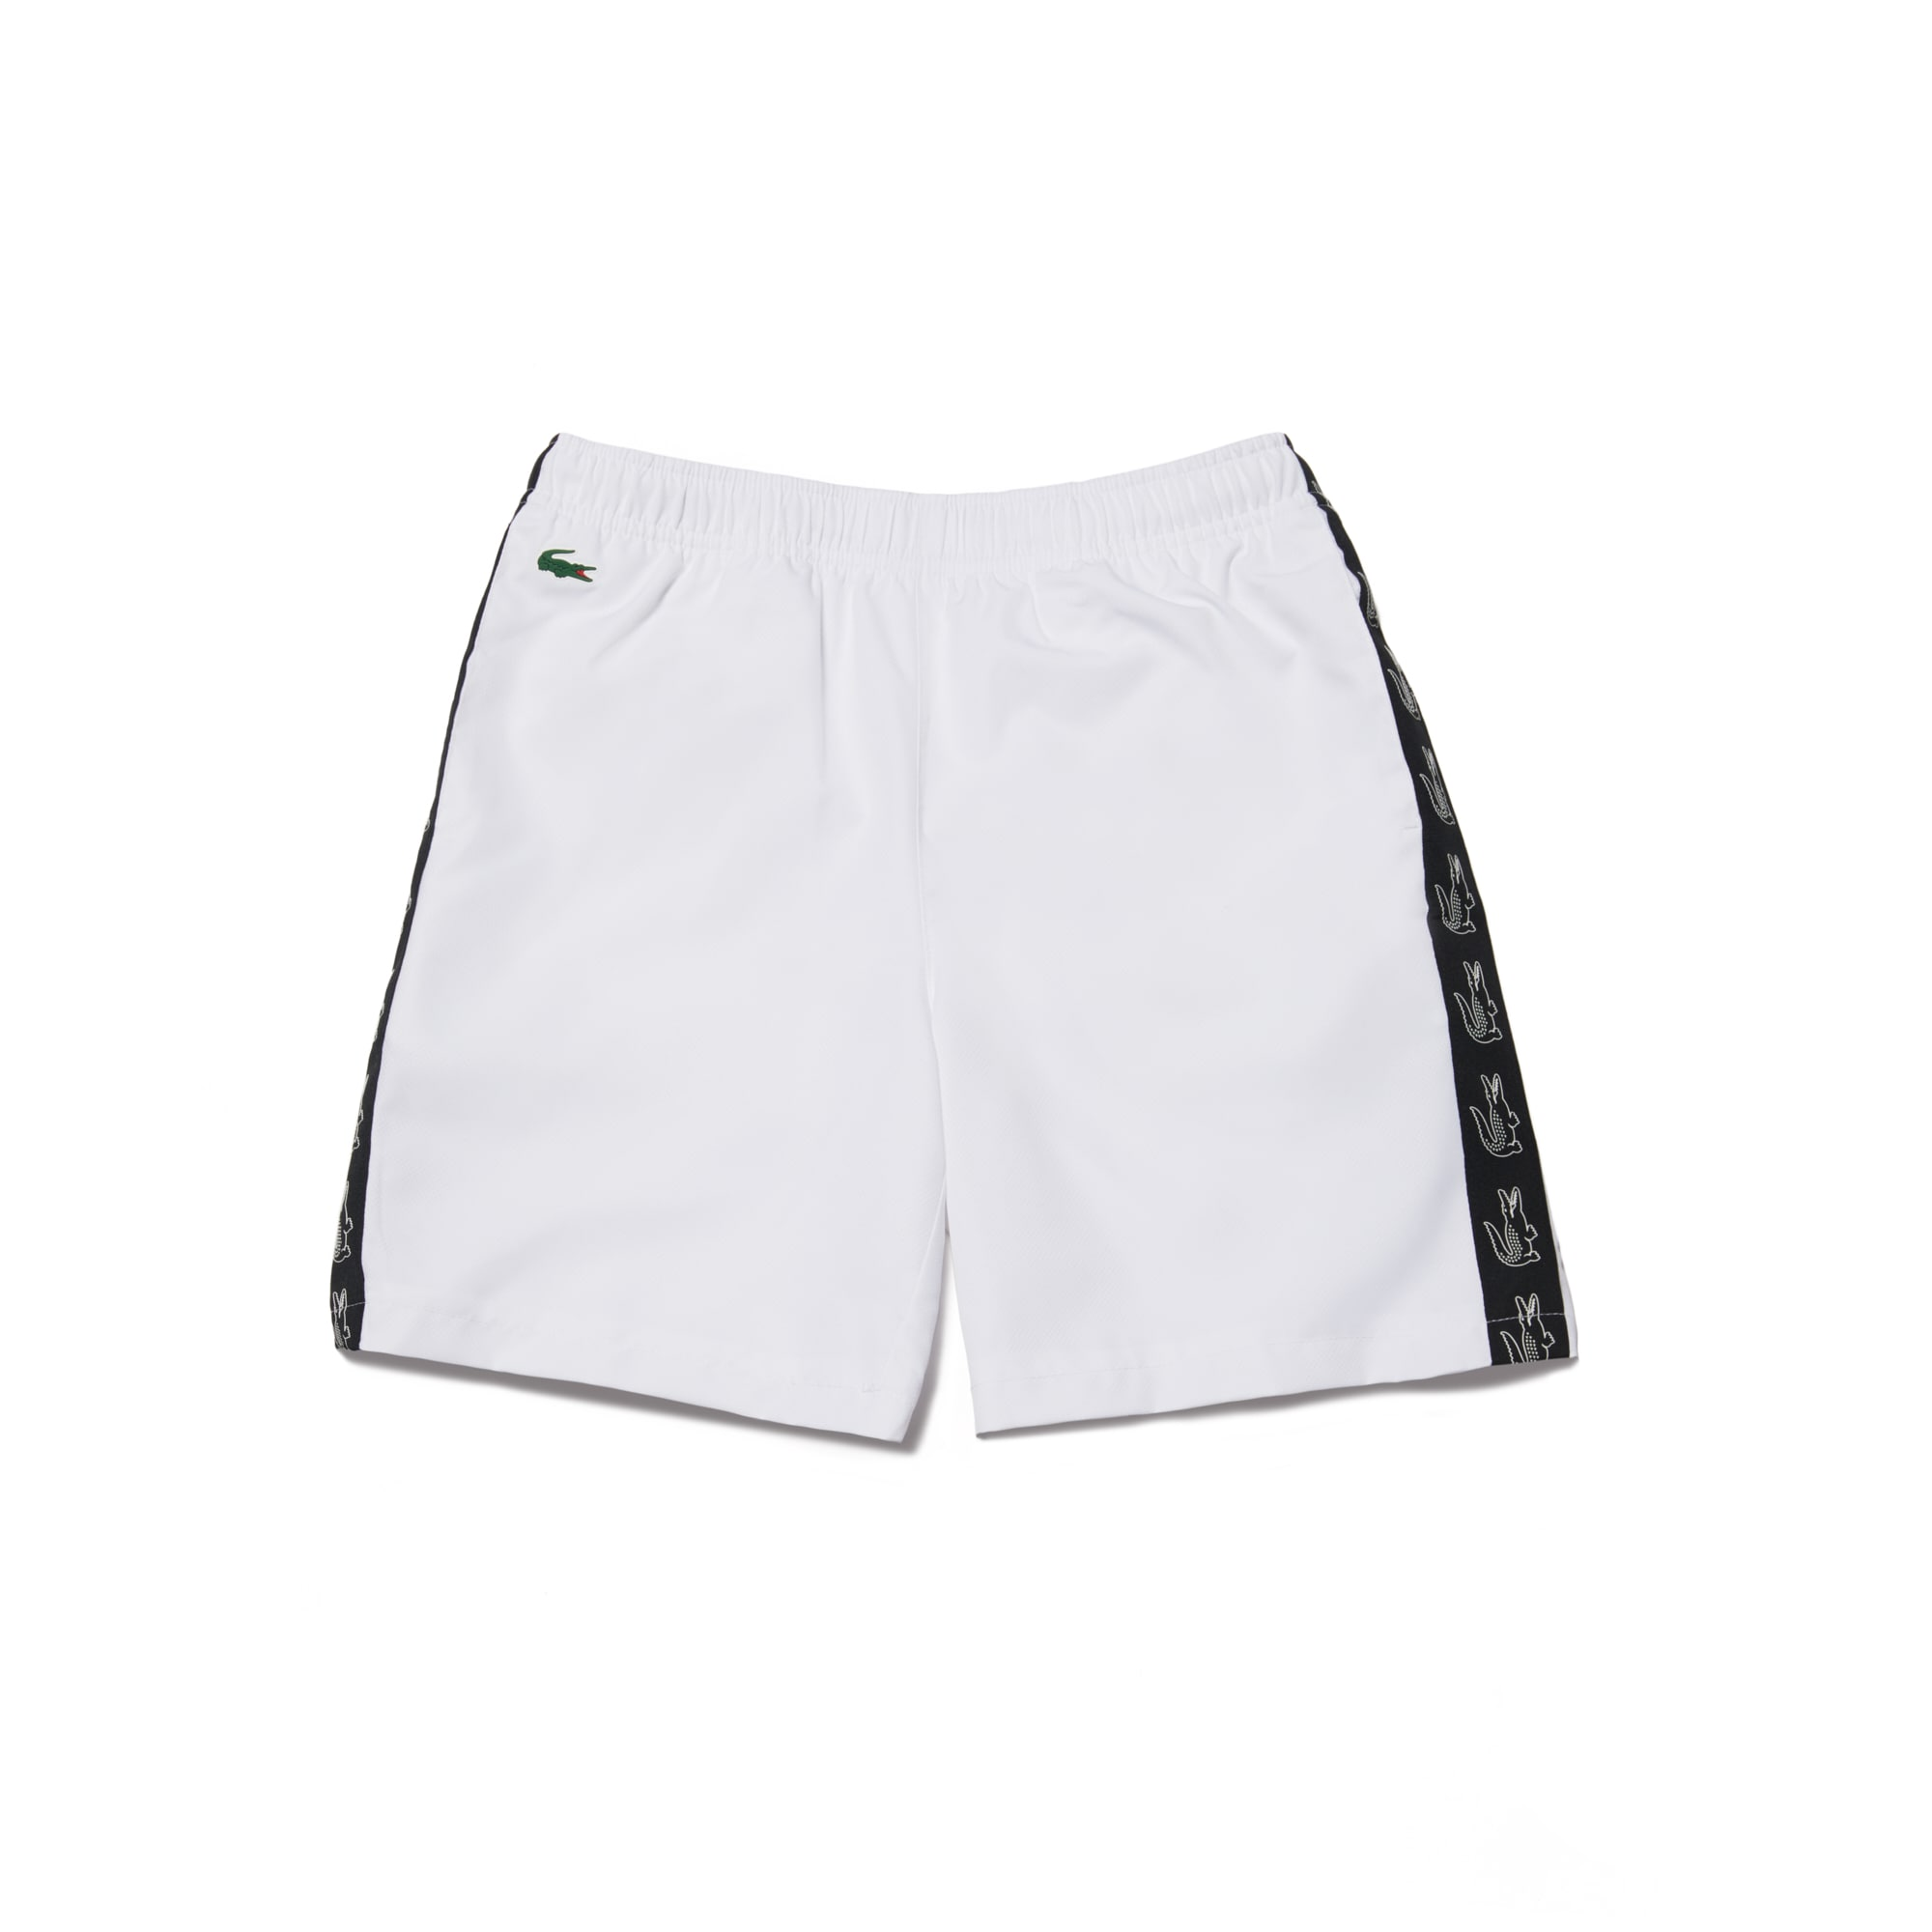 Boys' Lacoste SPORT Croc Print Band Lightweight Tennis Shorts